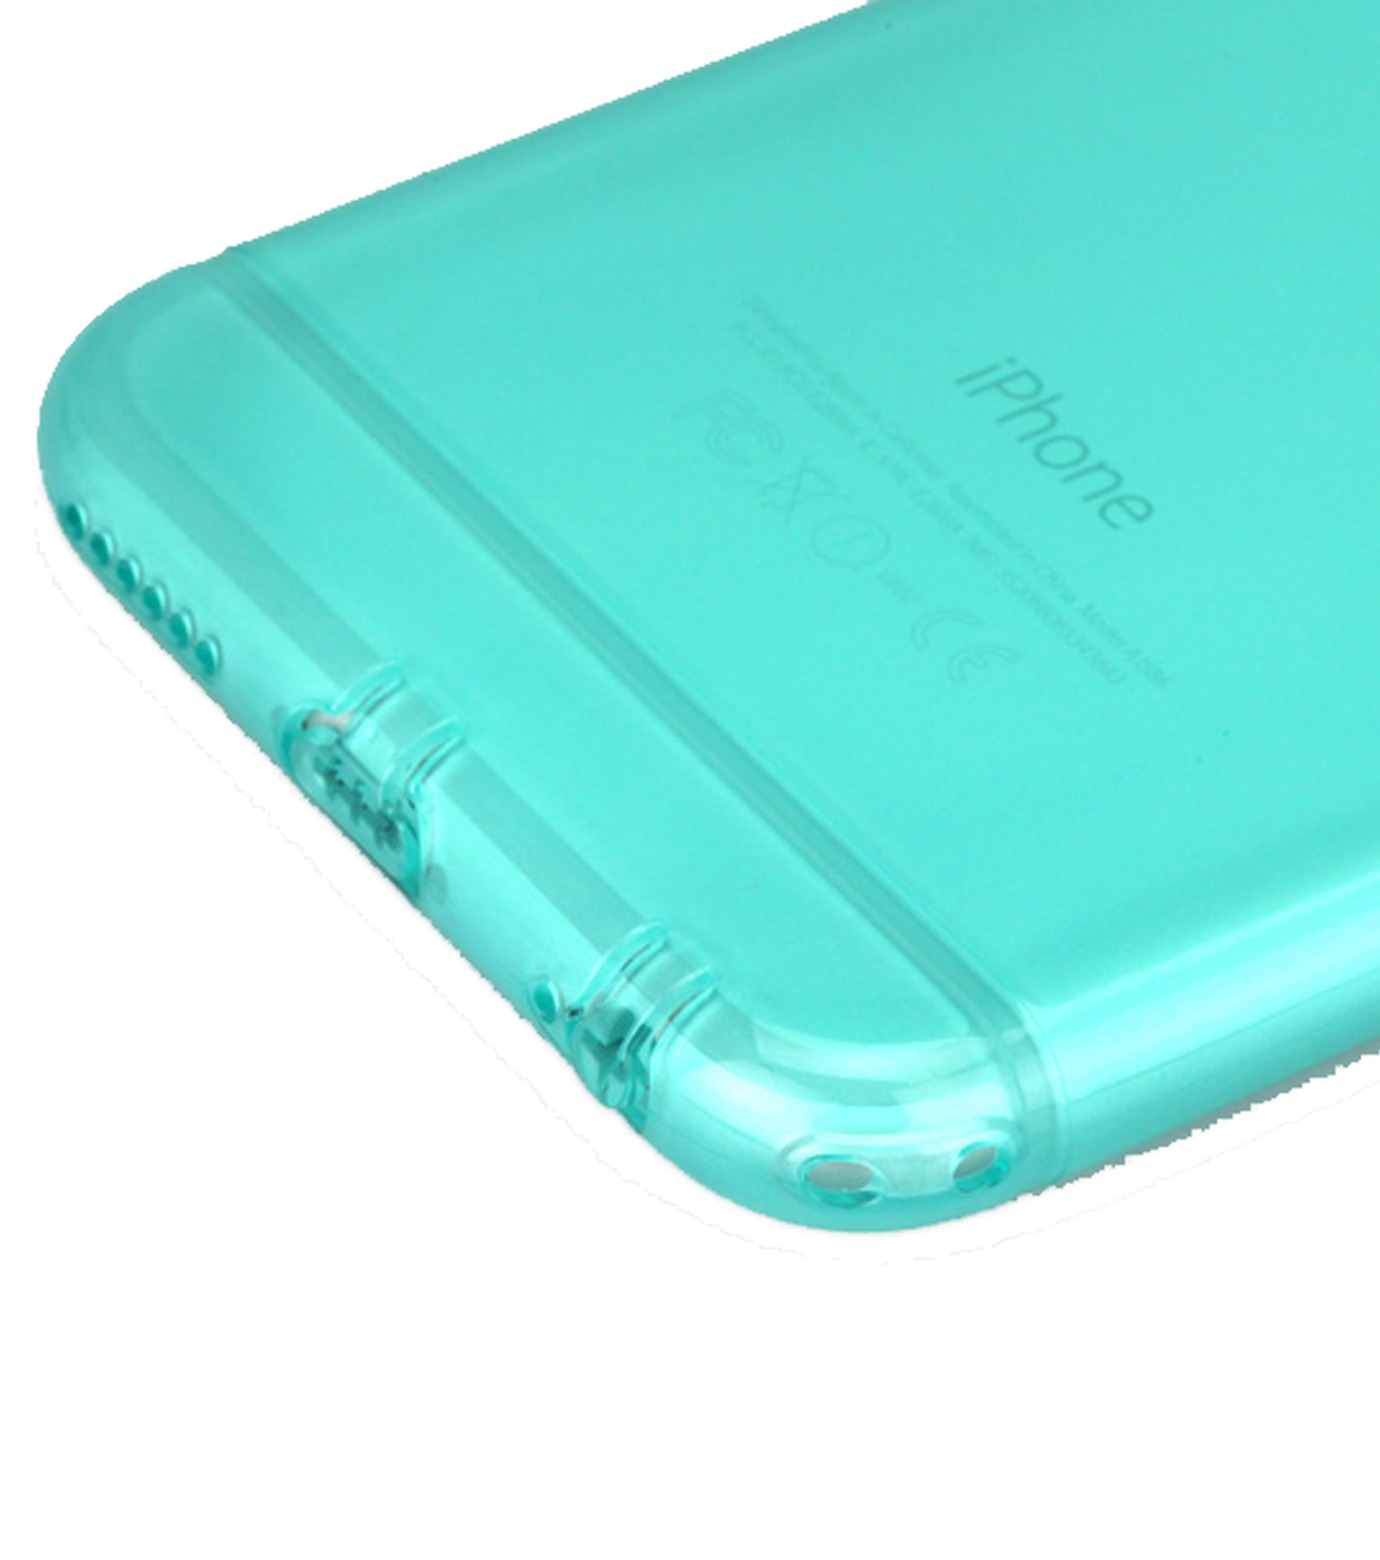 Tunewear(チューンウエア)のsoftshell 6/6s-NONE(ケースiphone6/6s/case iphone6/6s)-TUN-PH-0398-0 拡大詳細画像4